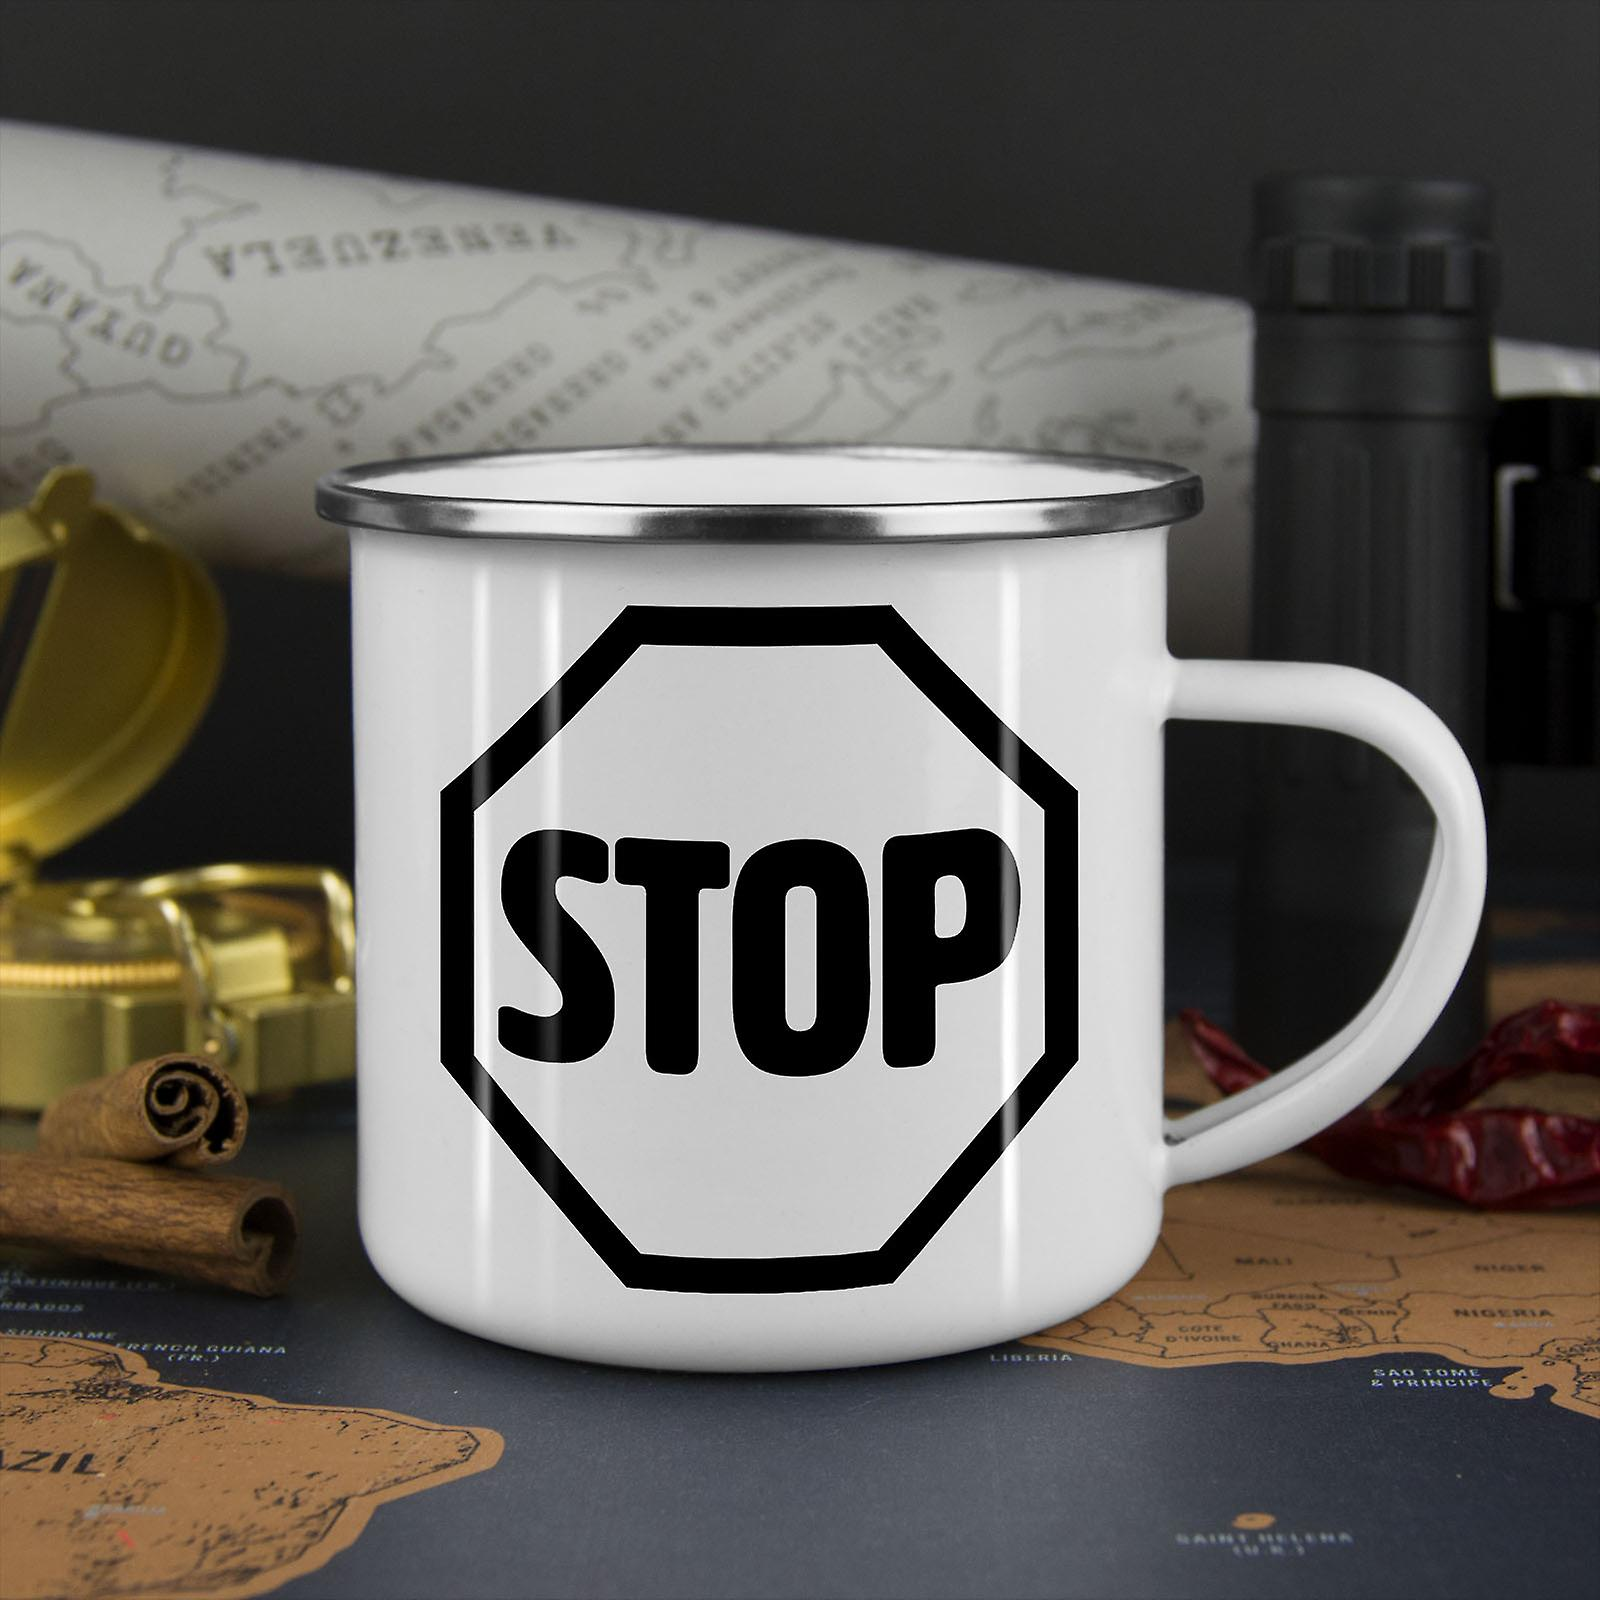 Stop-Schild Mode neu WhiteTea Kaffee Emaille Mug10 oz | Wellcoda